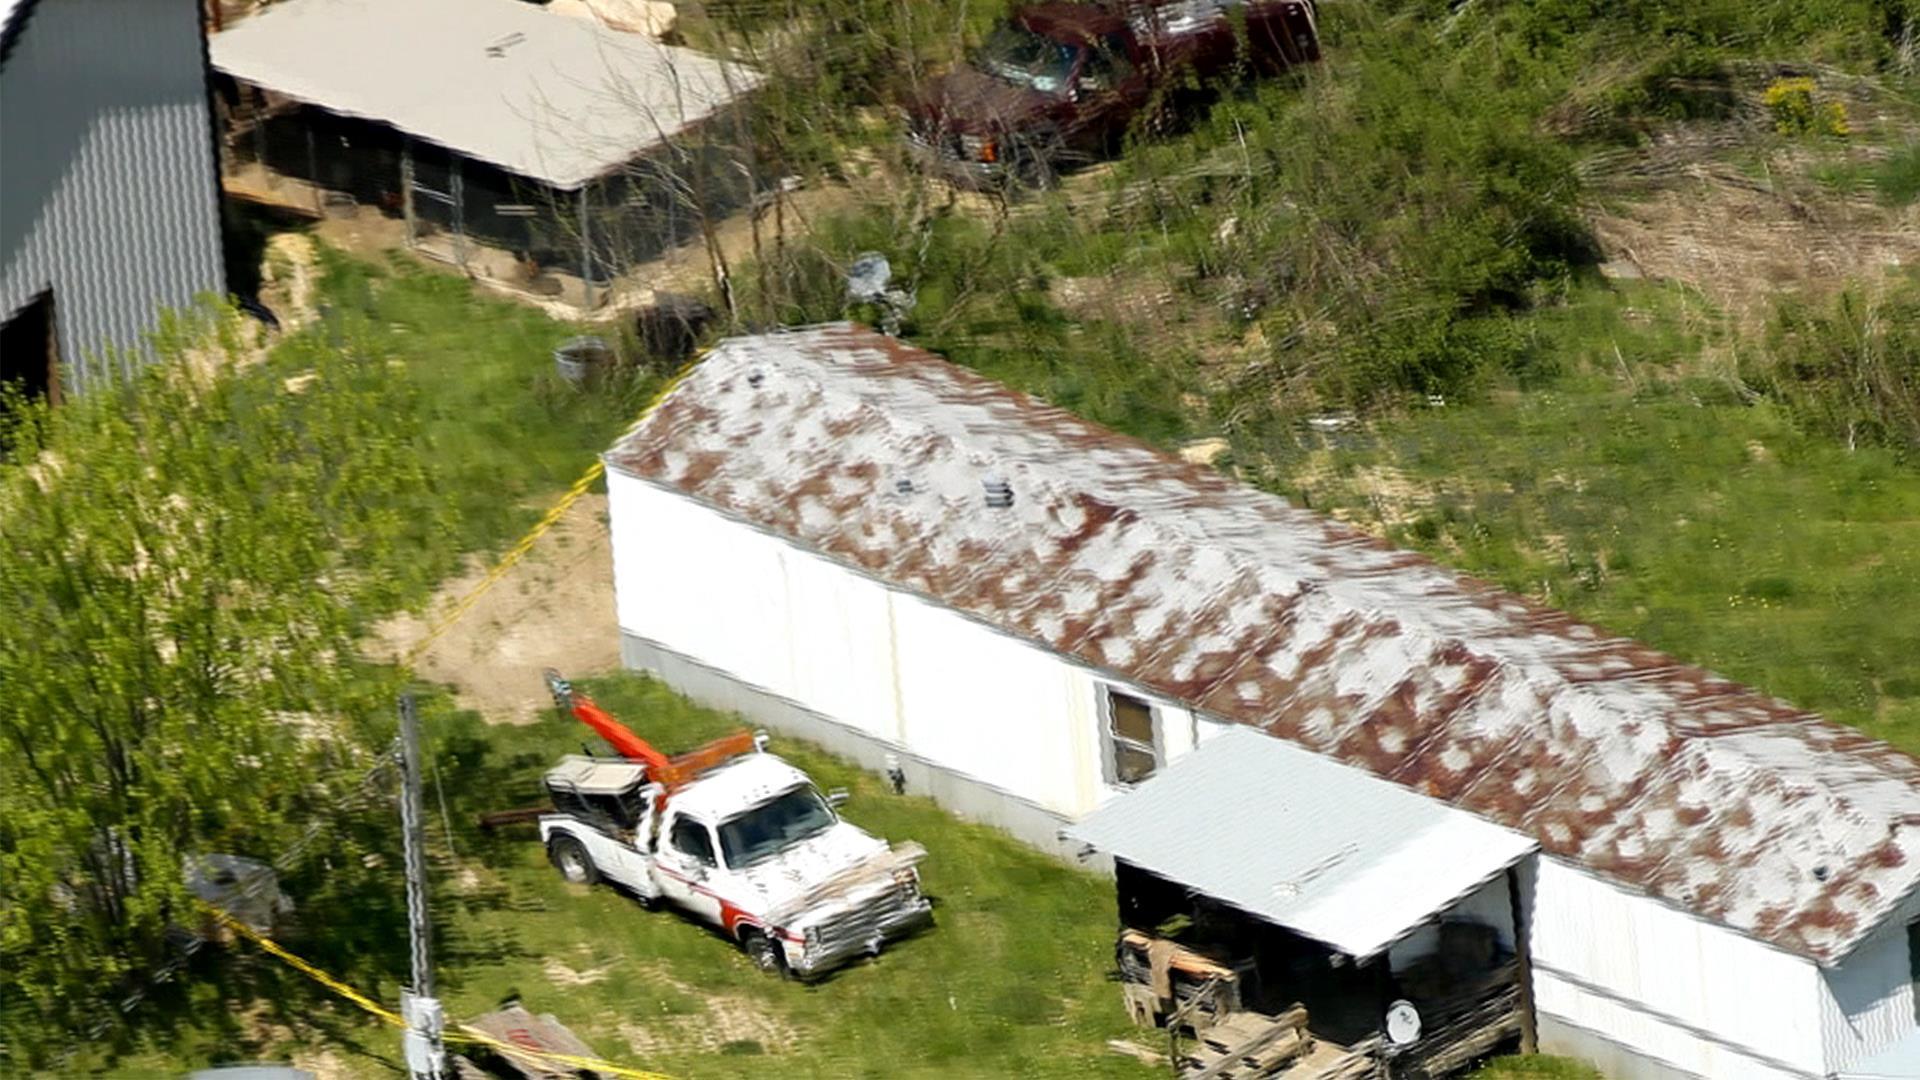 piketon massacre motive undetermined despite discovery of